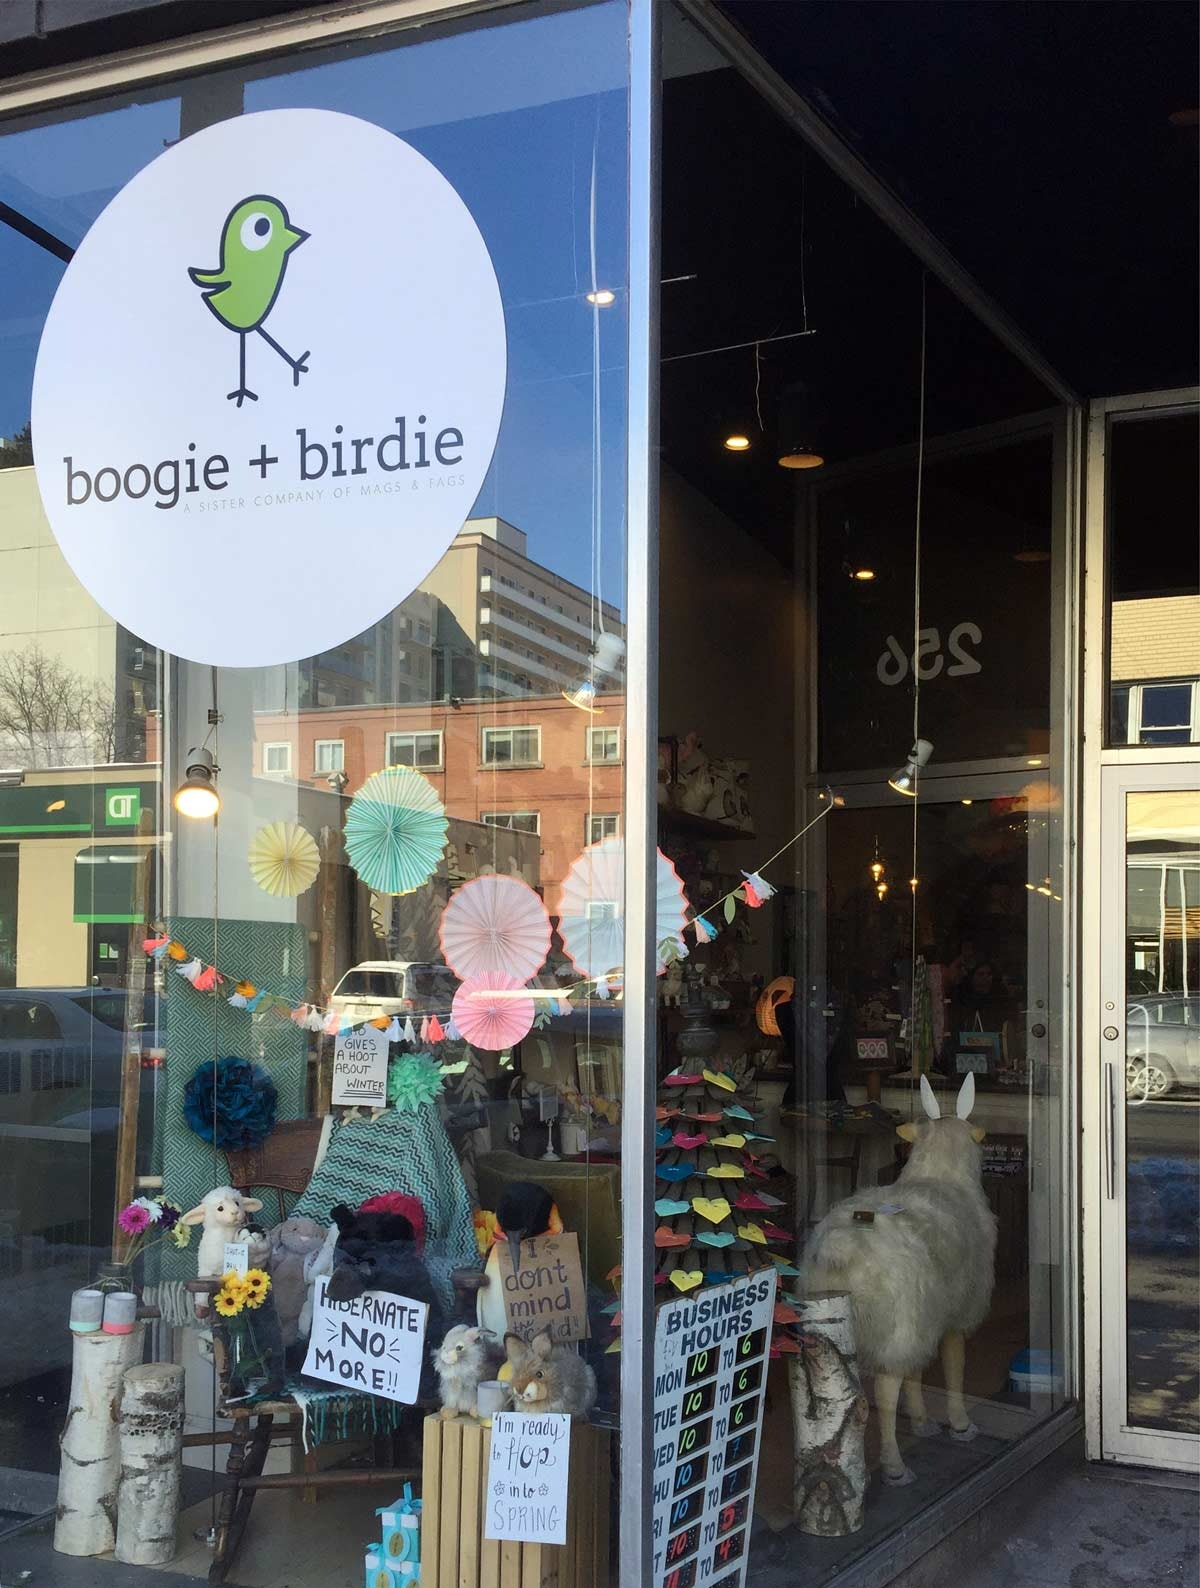 boogie + birdie